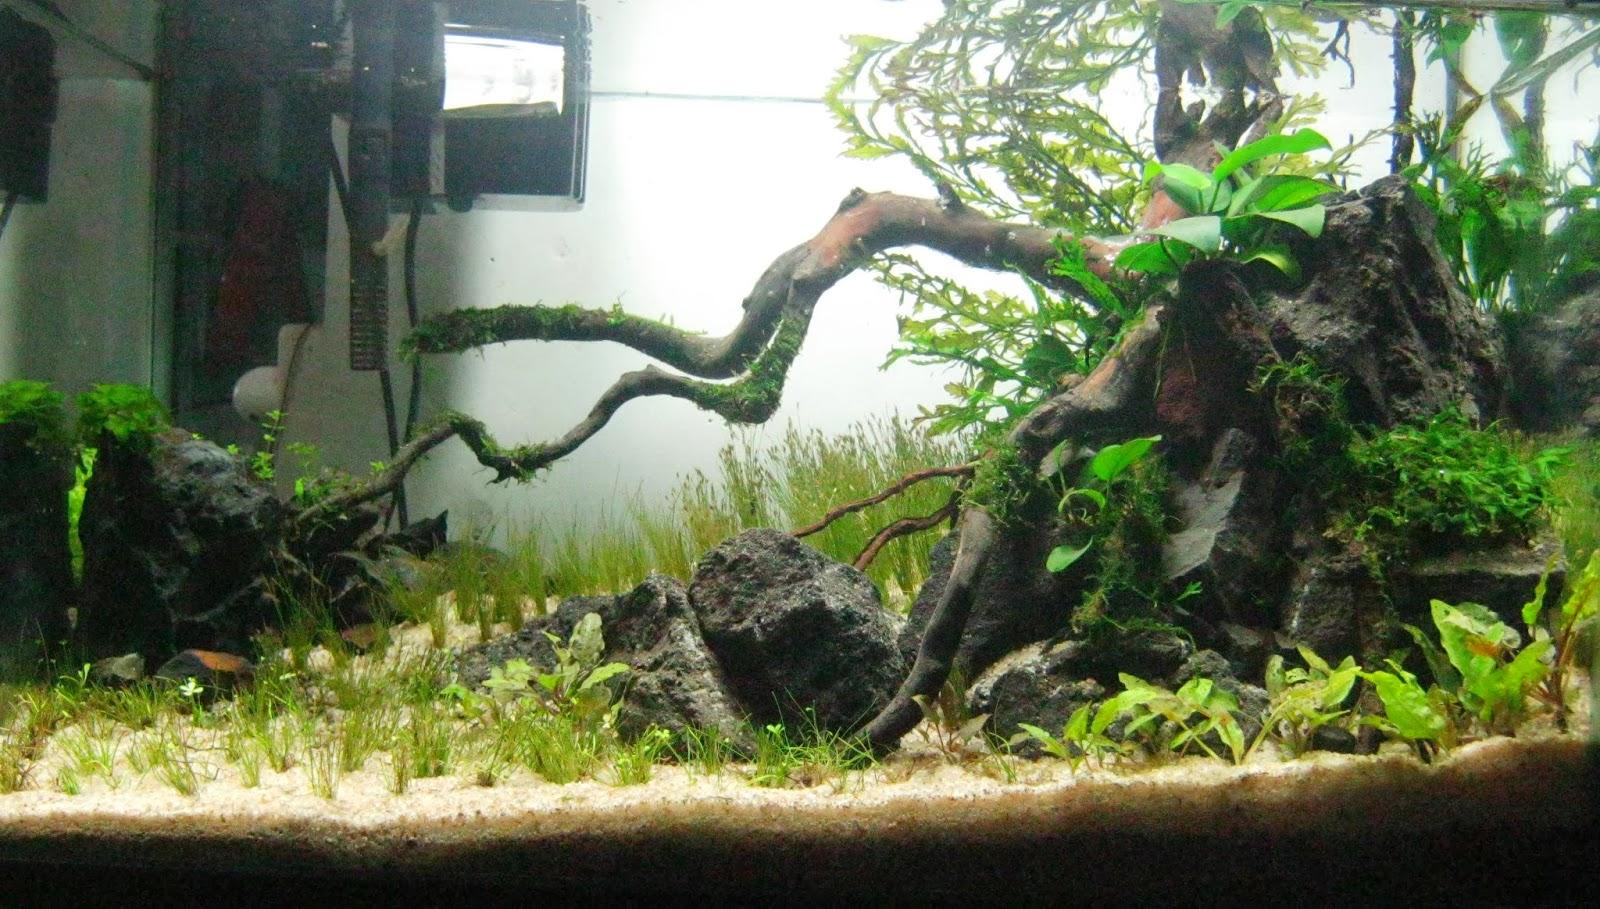 Iwaqu toko ikan hias aquascape ikan hias aquarium dan aksesories - Gambar aquascape ...